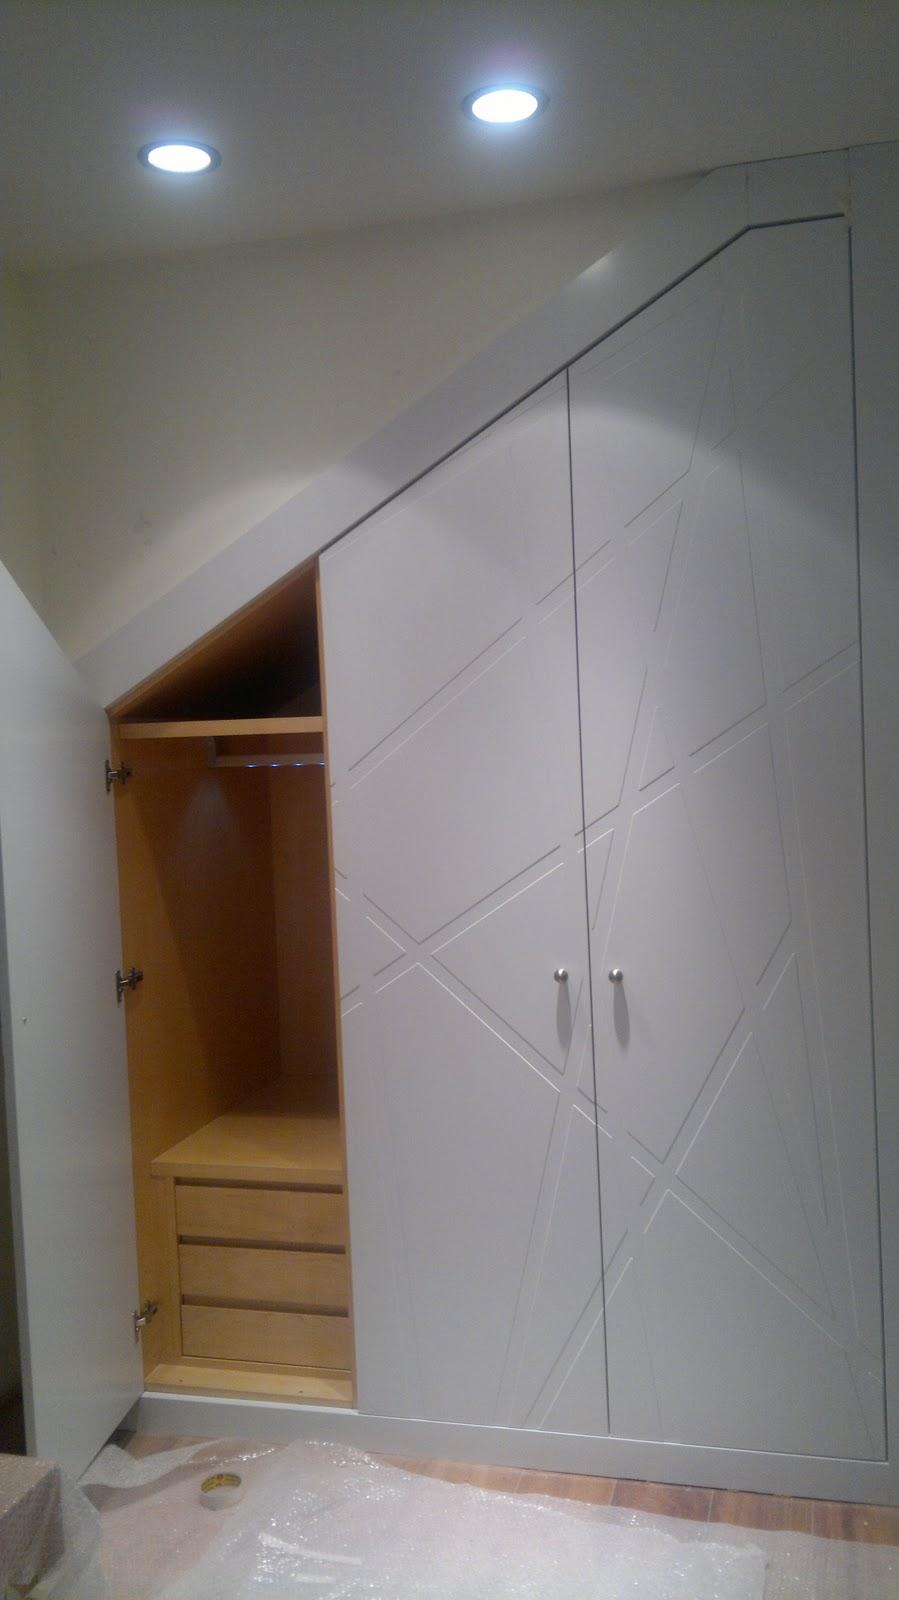 Ebanisteria carpinteria manuel perez zaragoza armario for Puertas debajo escalera